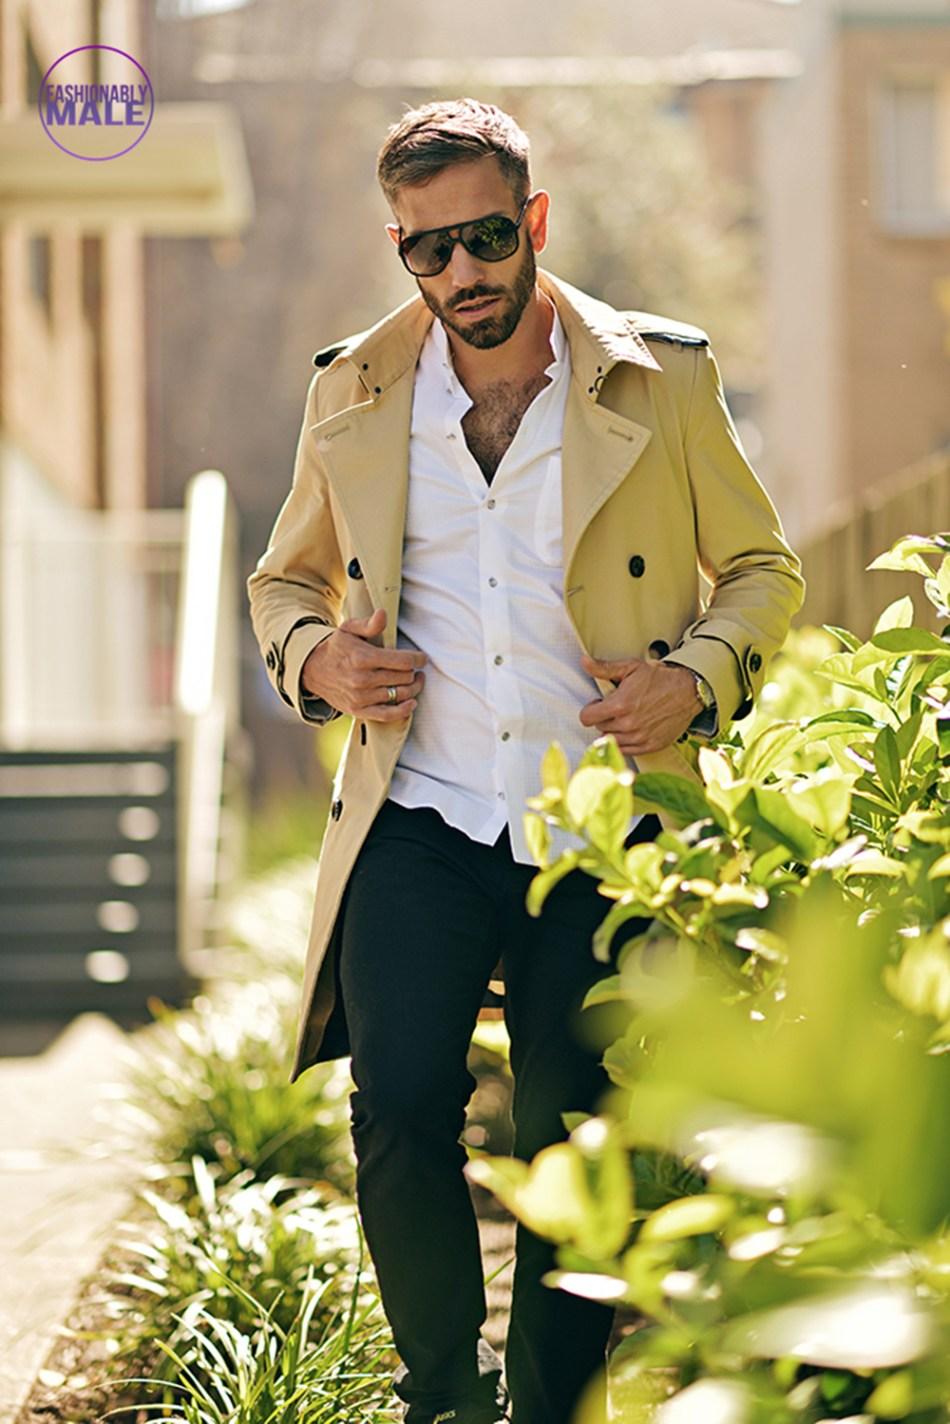 Stephane Marti by Shotsbygun for Fashionably Male2